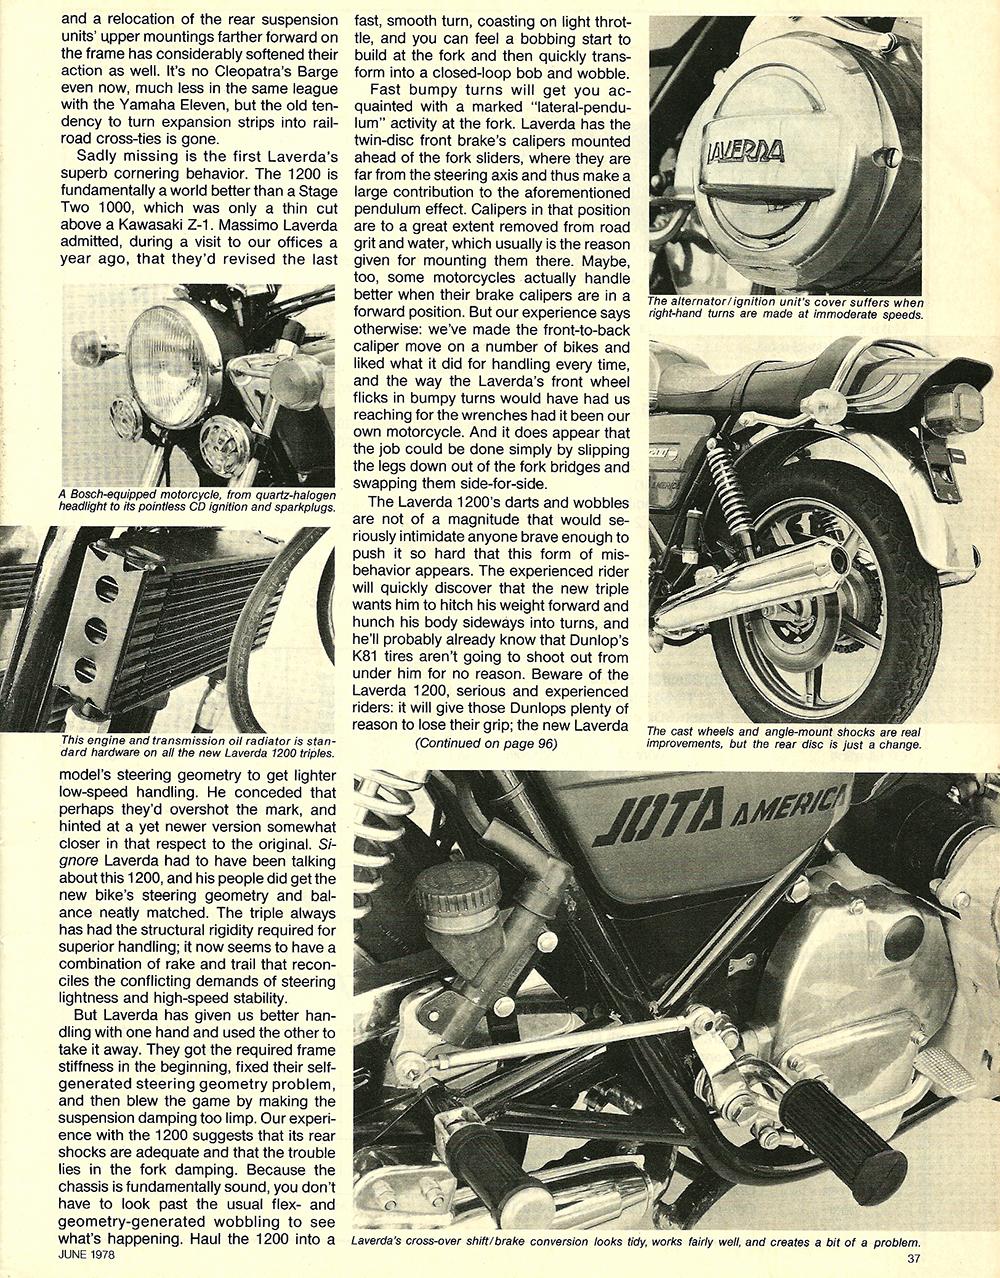 1978 Laverda 1200 Jota America road test 6.jpg